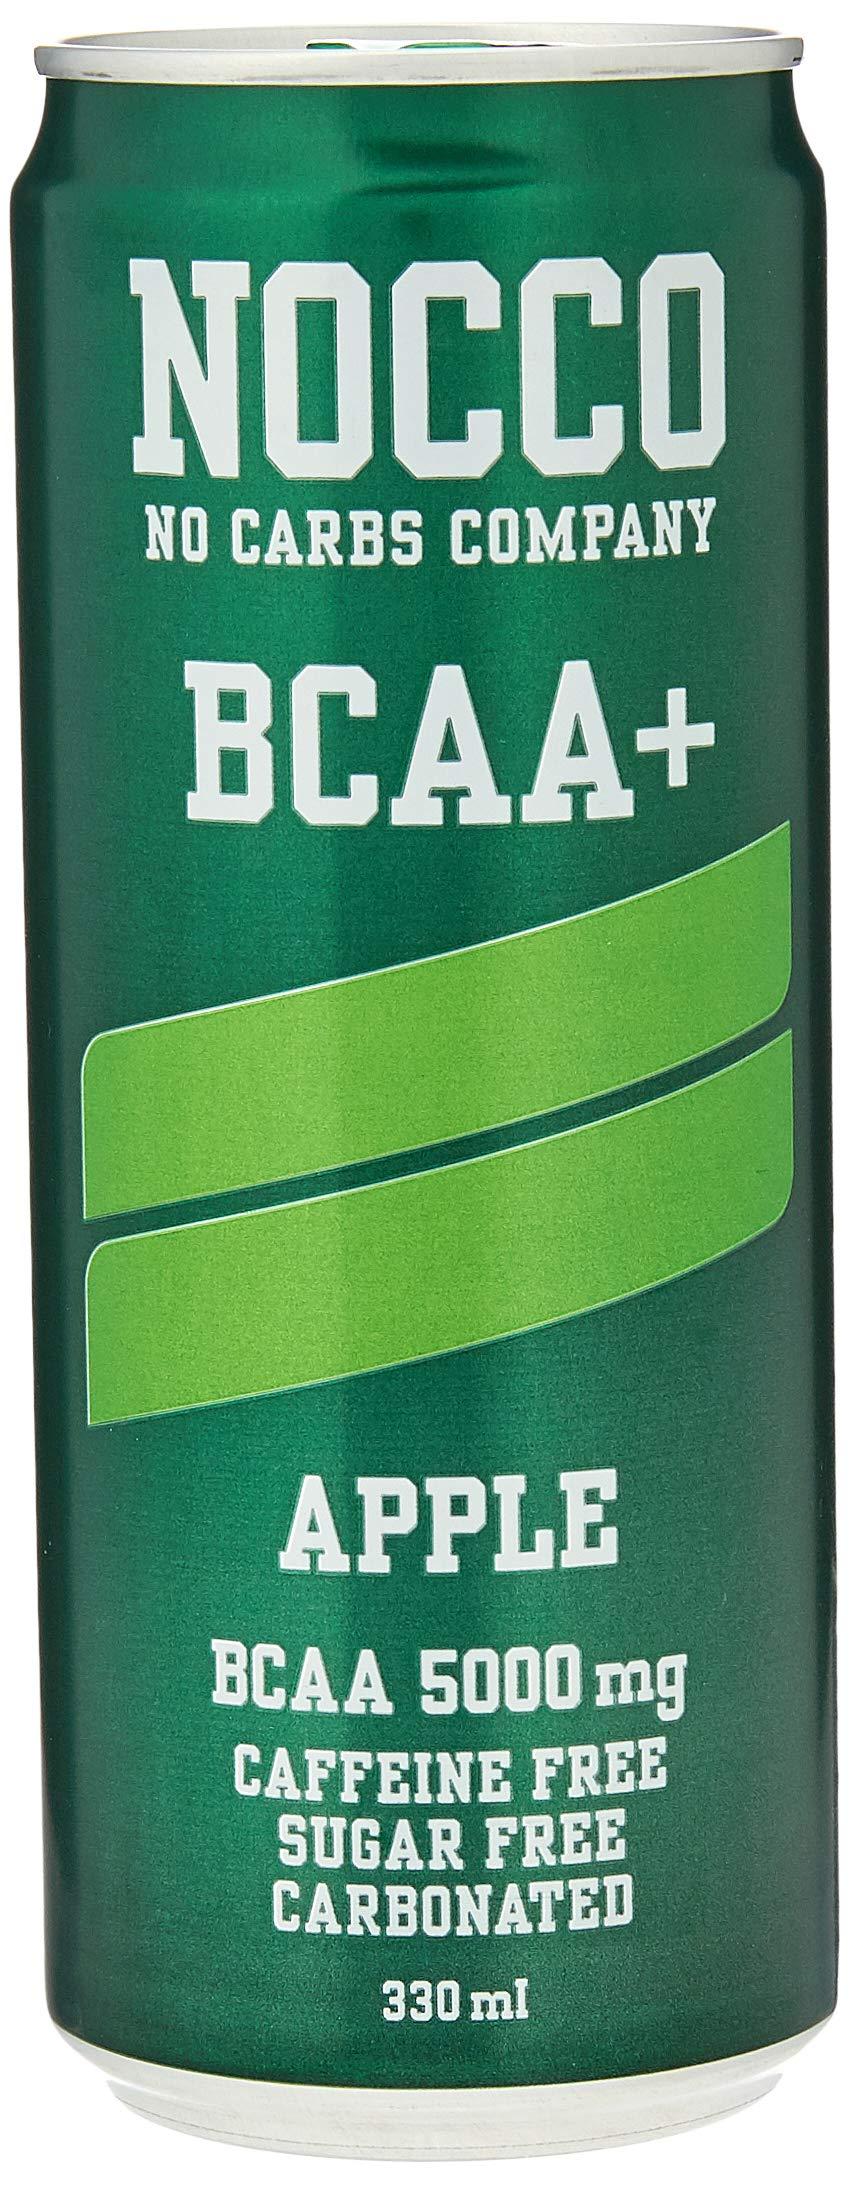 NOCCO BCAA+ Apple | 24 x 330ml | Zero Sugar | Functional Energy Drink | No Carbs Company | Vitamin Enhanced Zero…